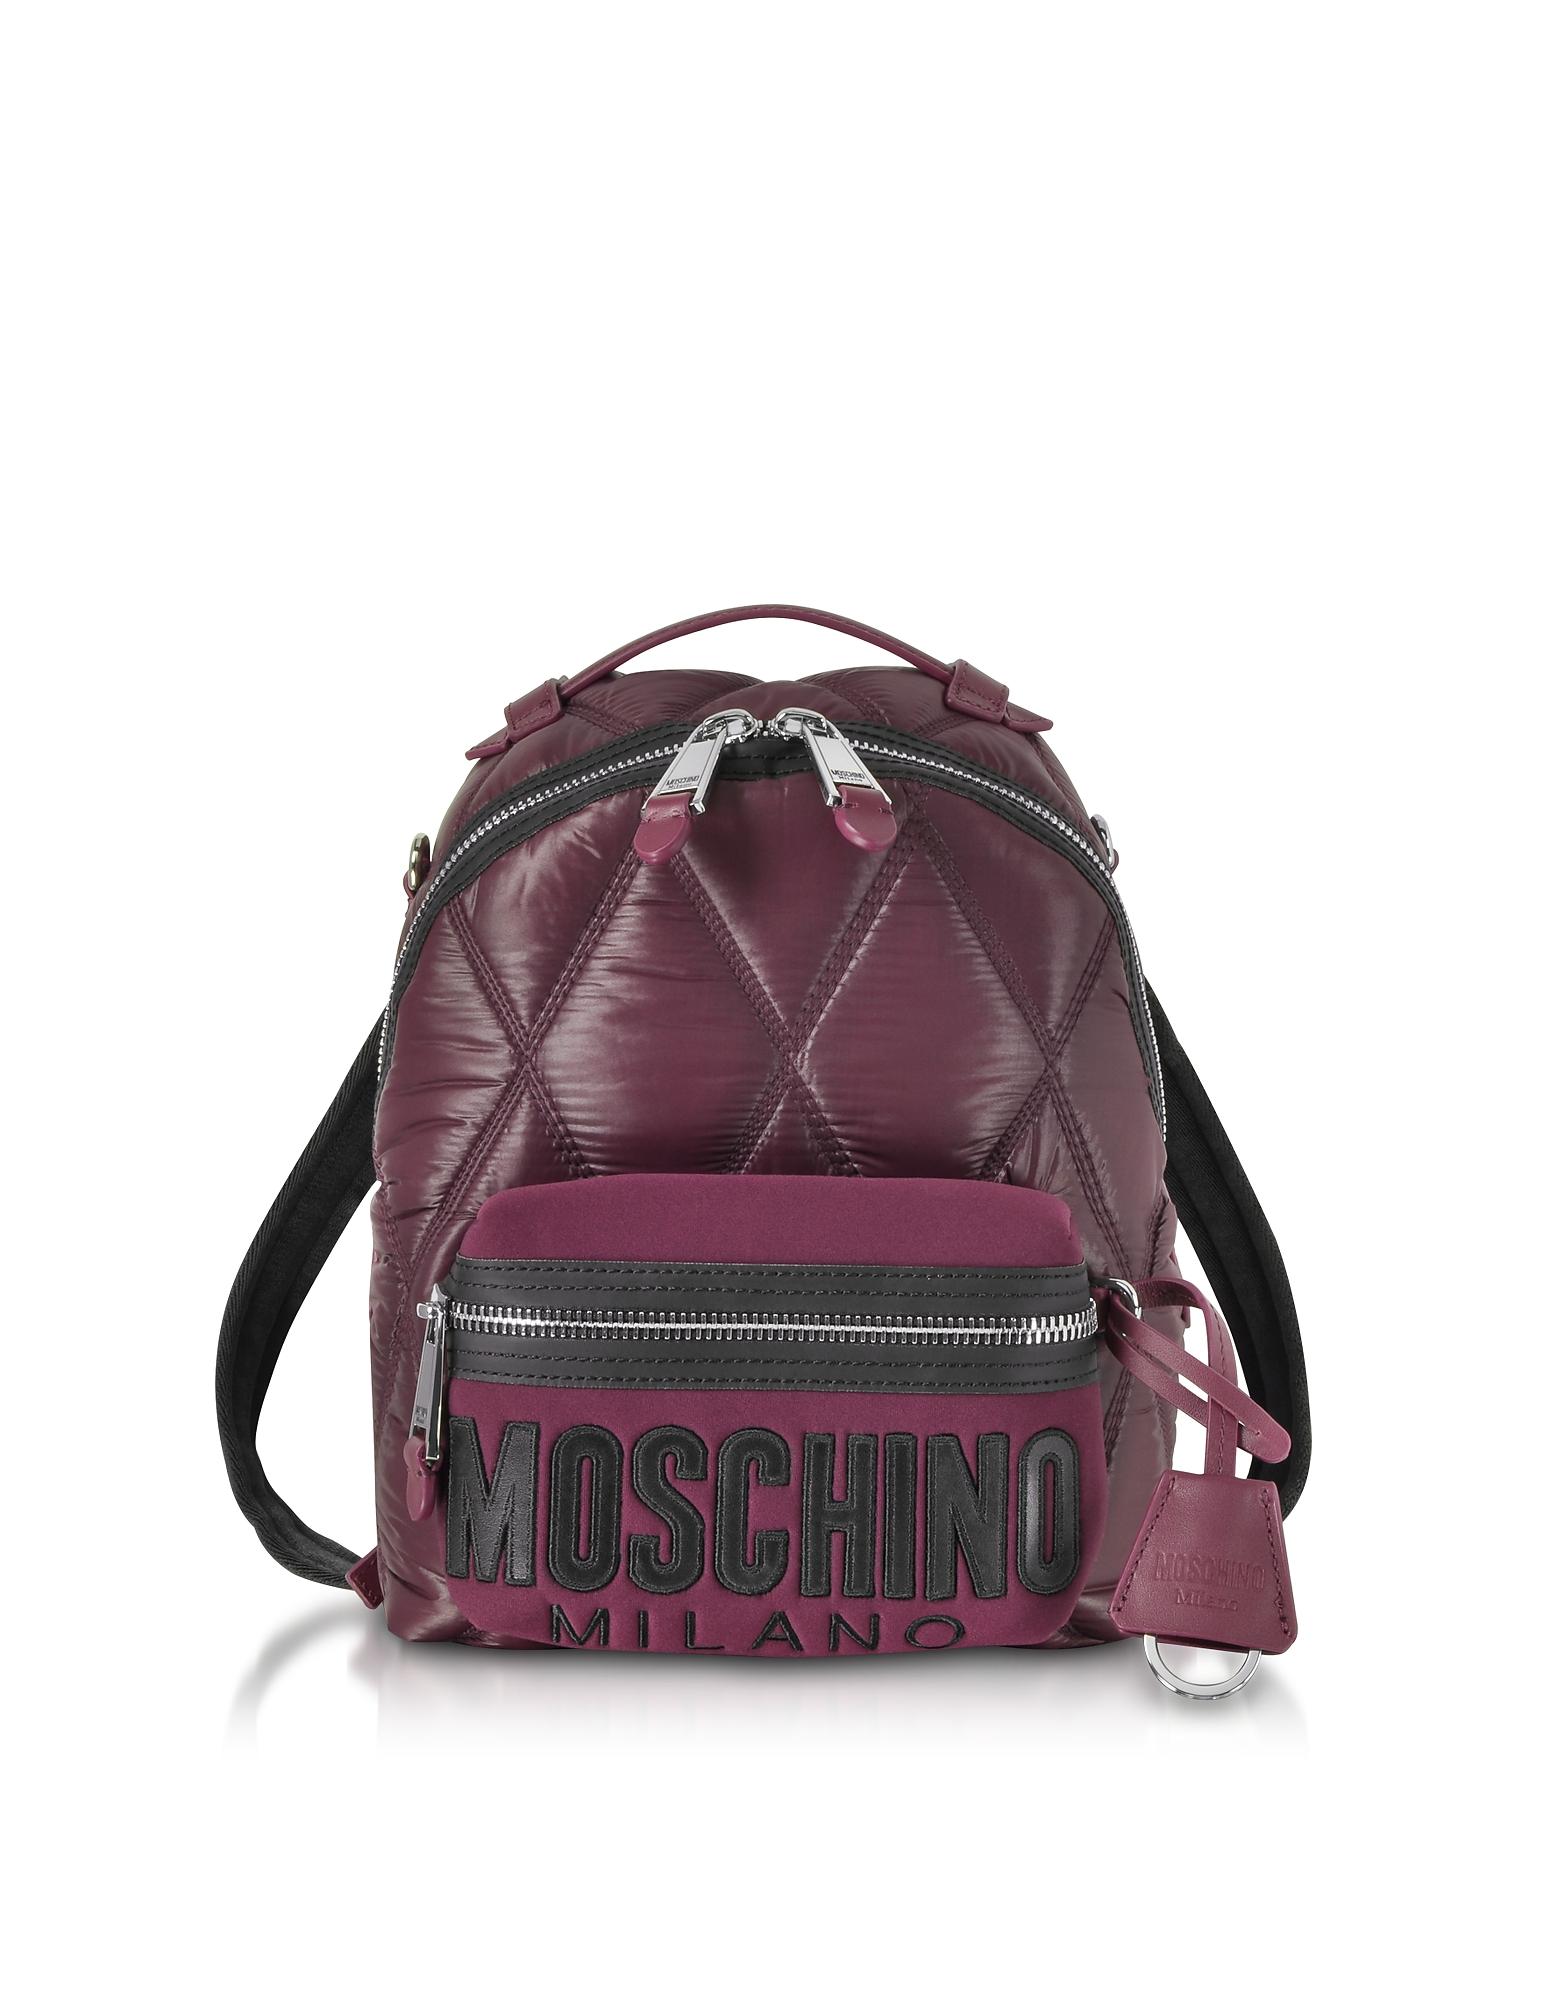 Moschino Handbags, Quilted Nylon Signature Backpack